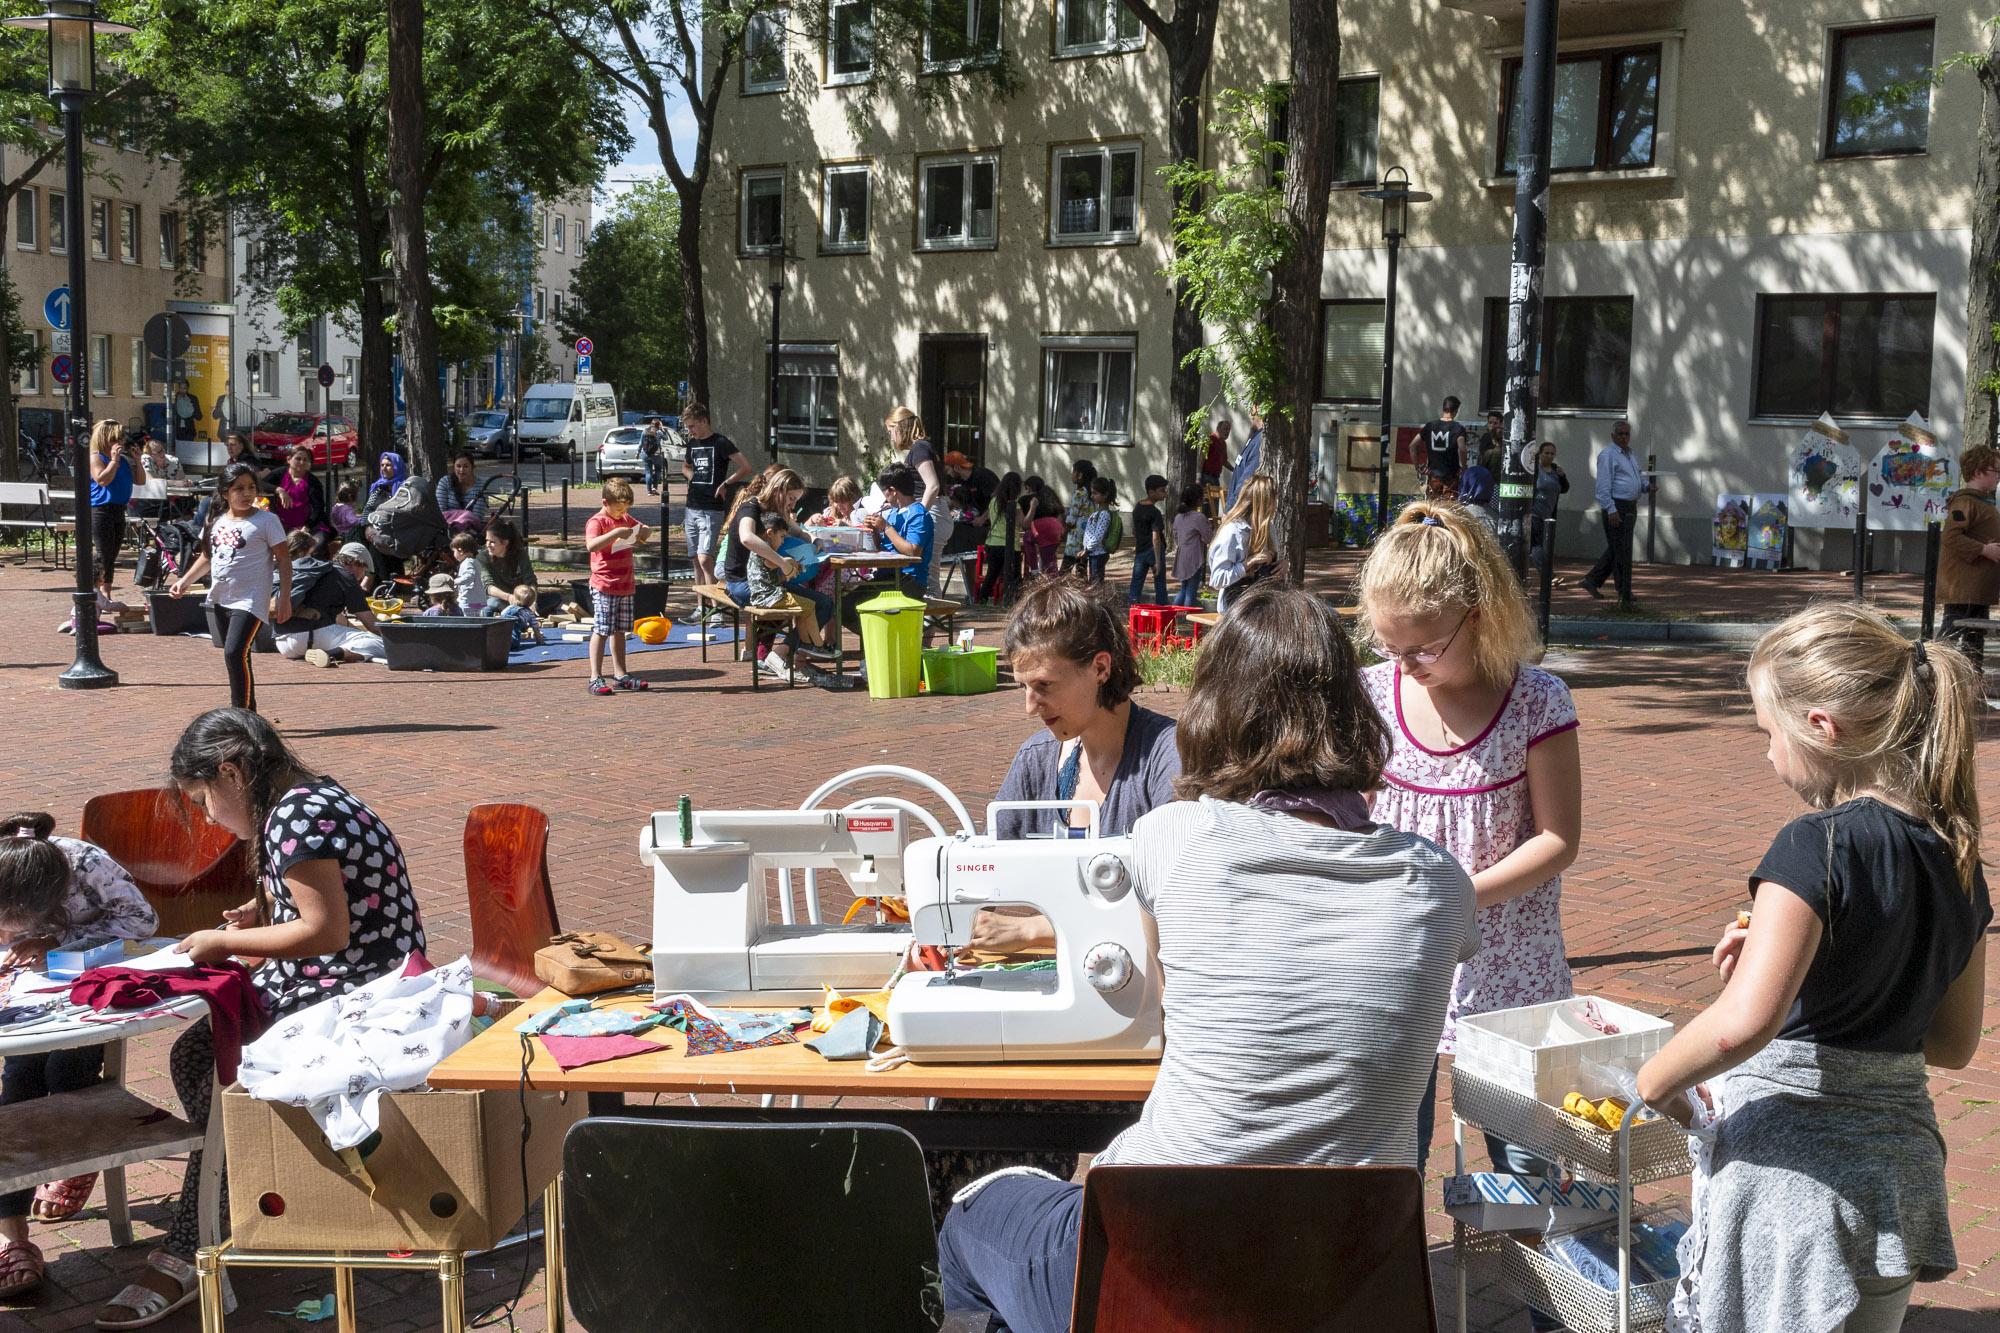 Ottoplatz